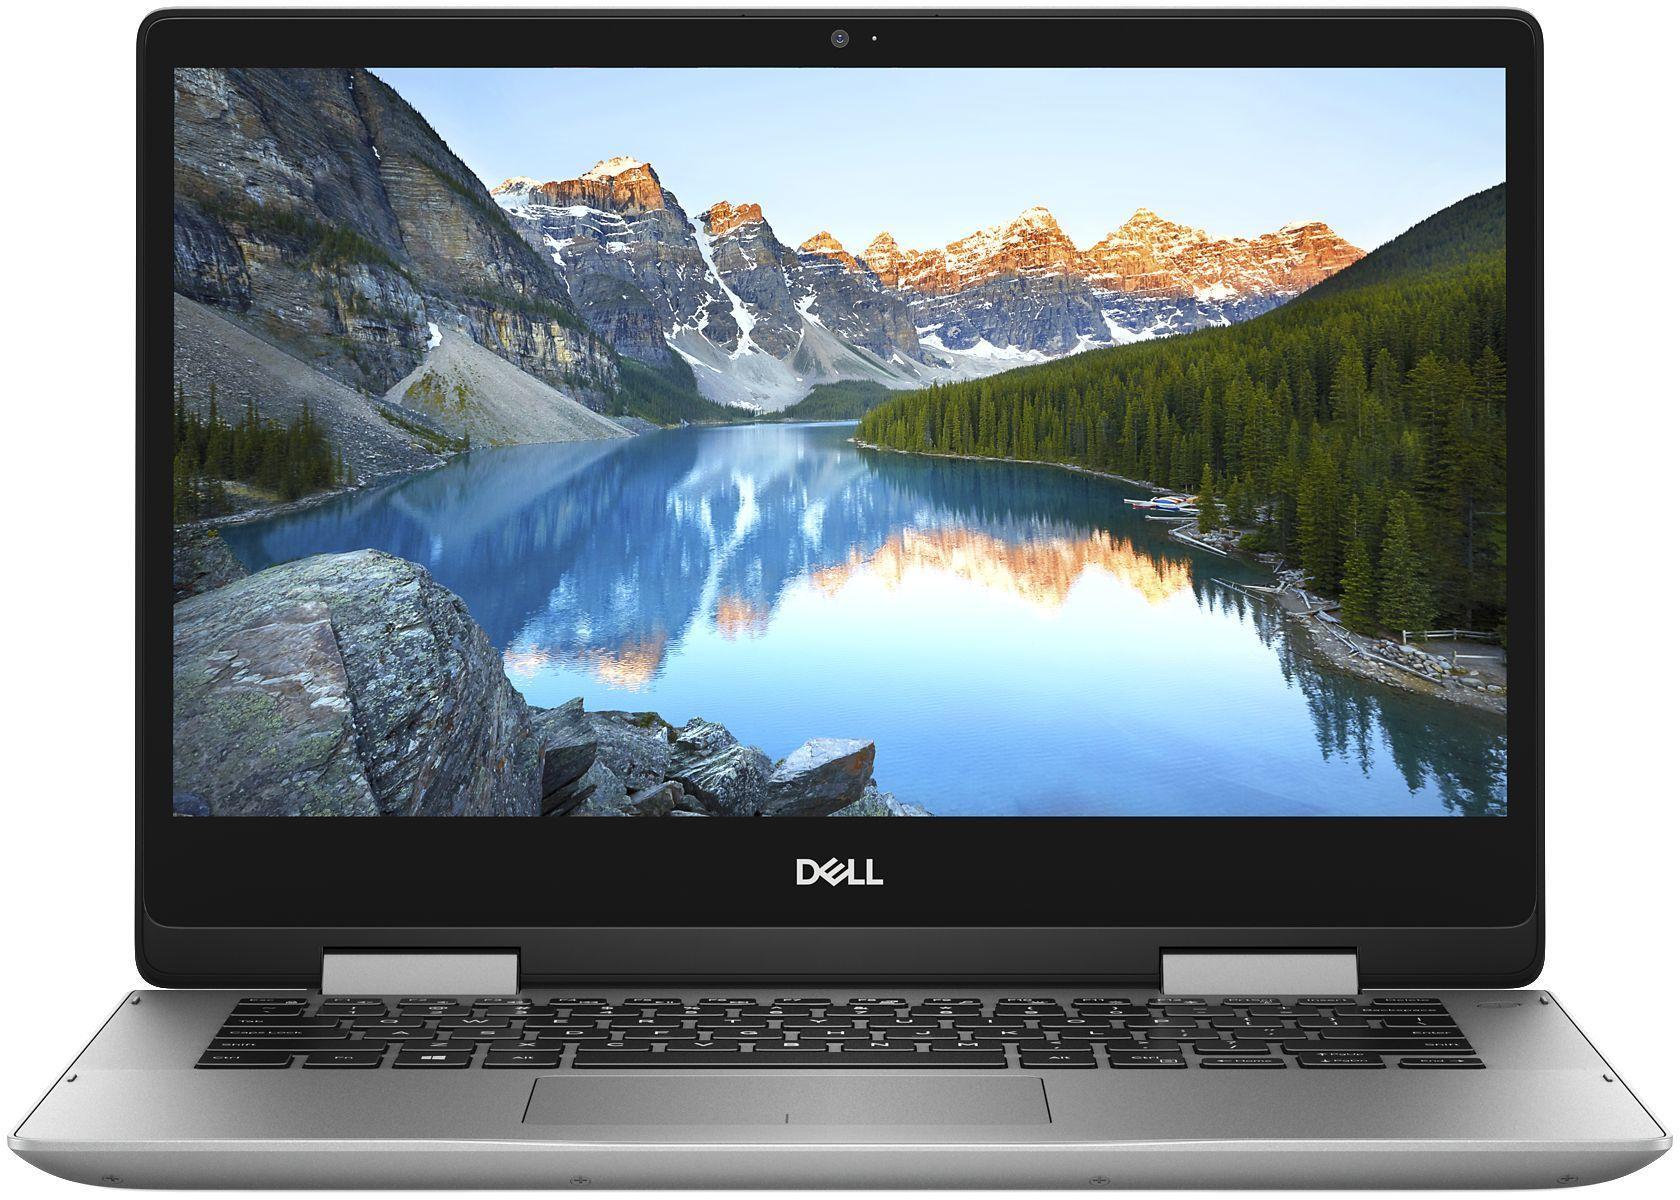 Купить Ноутбук Dell Inspiron 5482 (5482-7058) фото 1